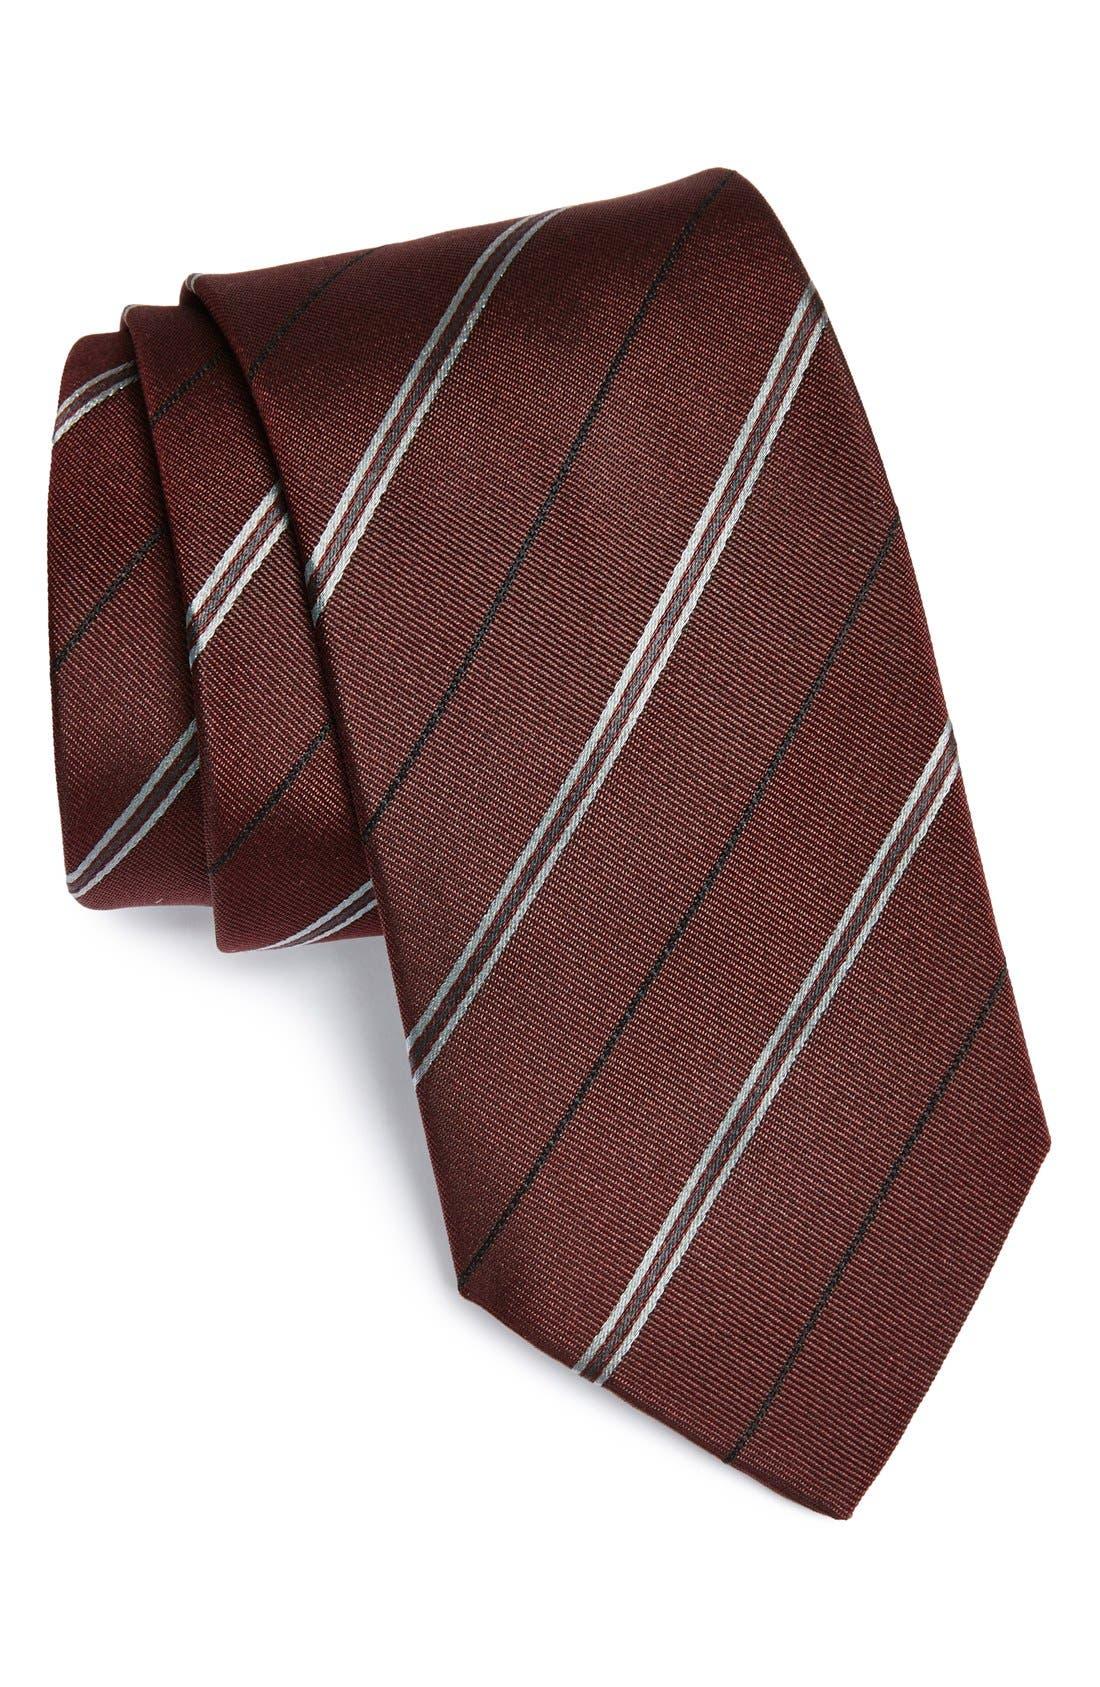 Alternate Image 1 Selected - Dolce&Gabbana Woven Silk Tie